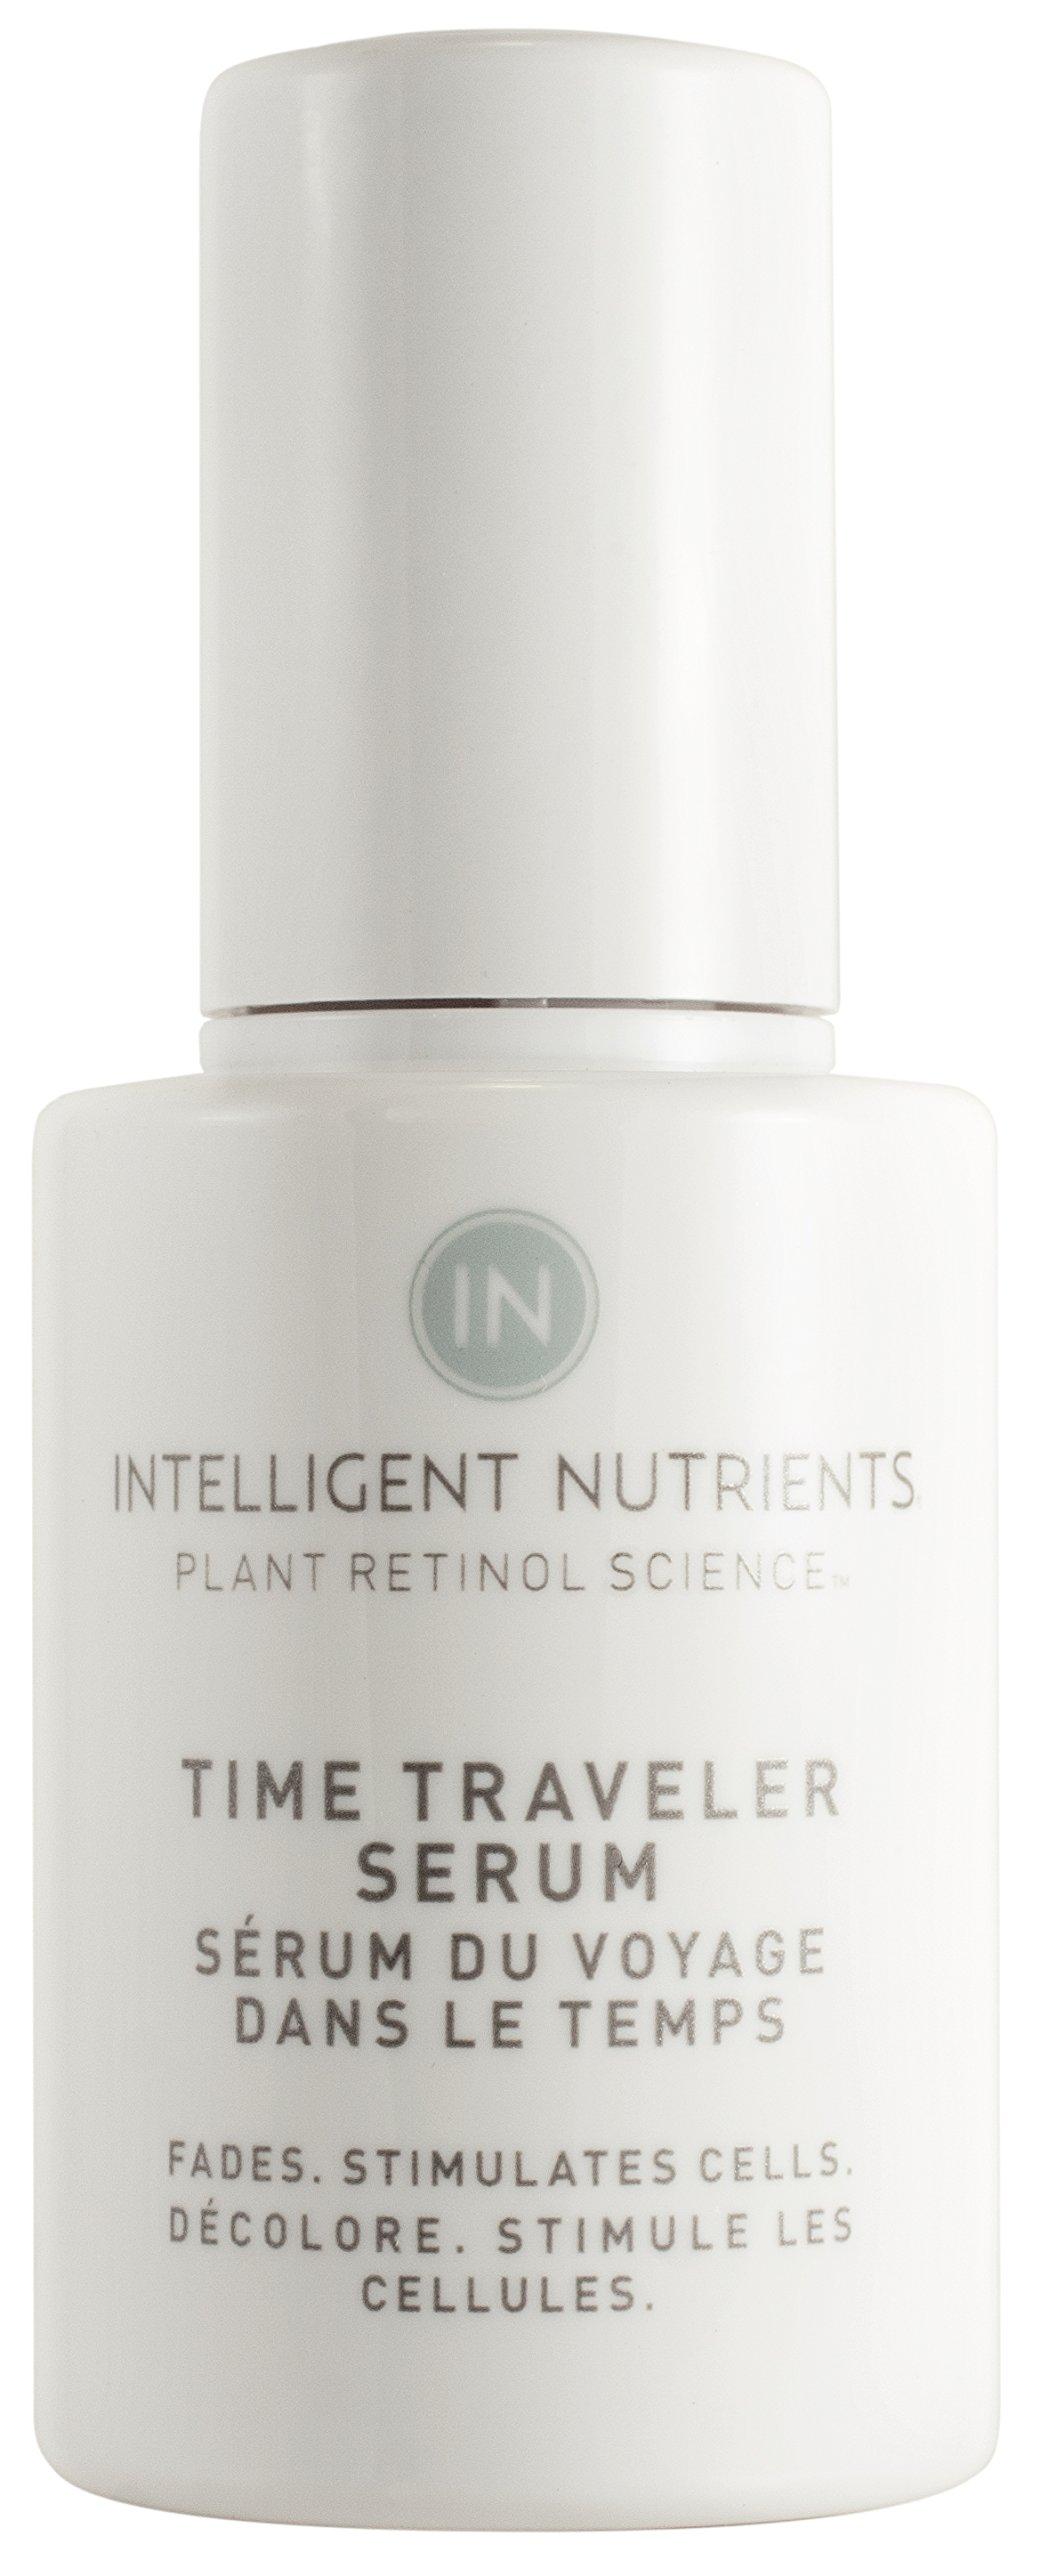 Intelligent Nutrients Plant Retinol Time Traveler Serum - Certified Organic Plant Retinol Serum with Red Algae for All Skin Types (1 oz)